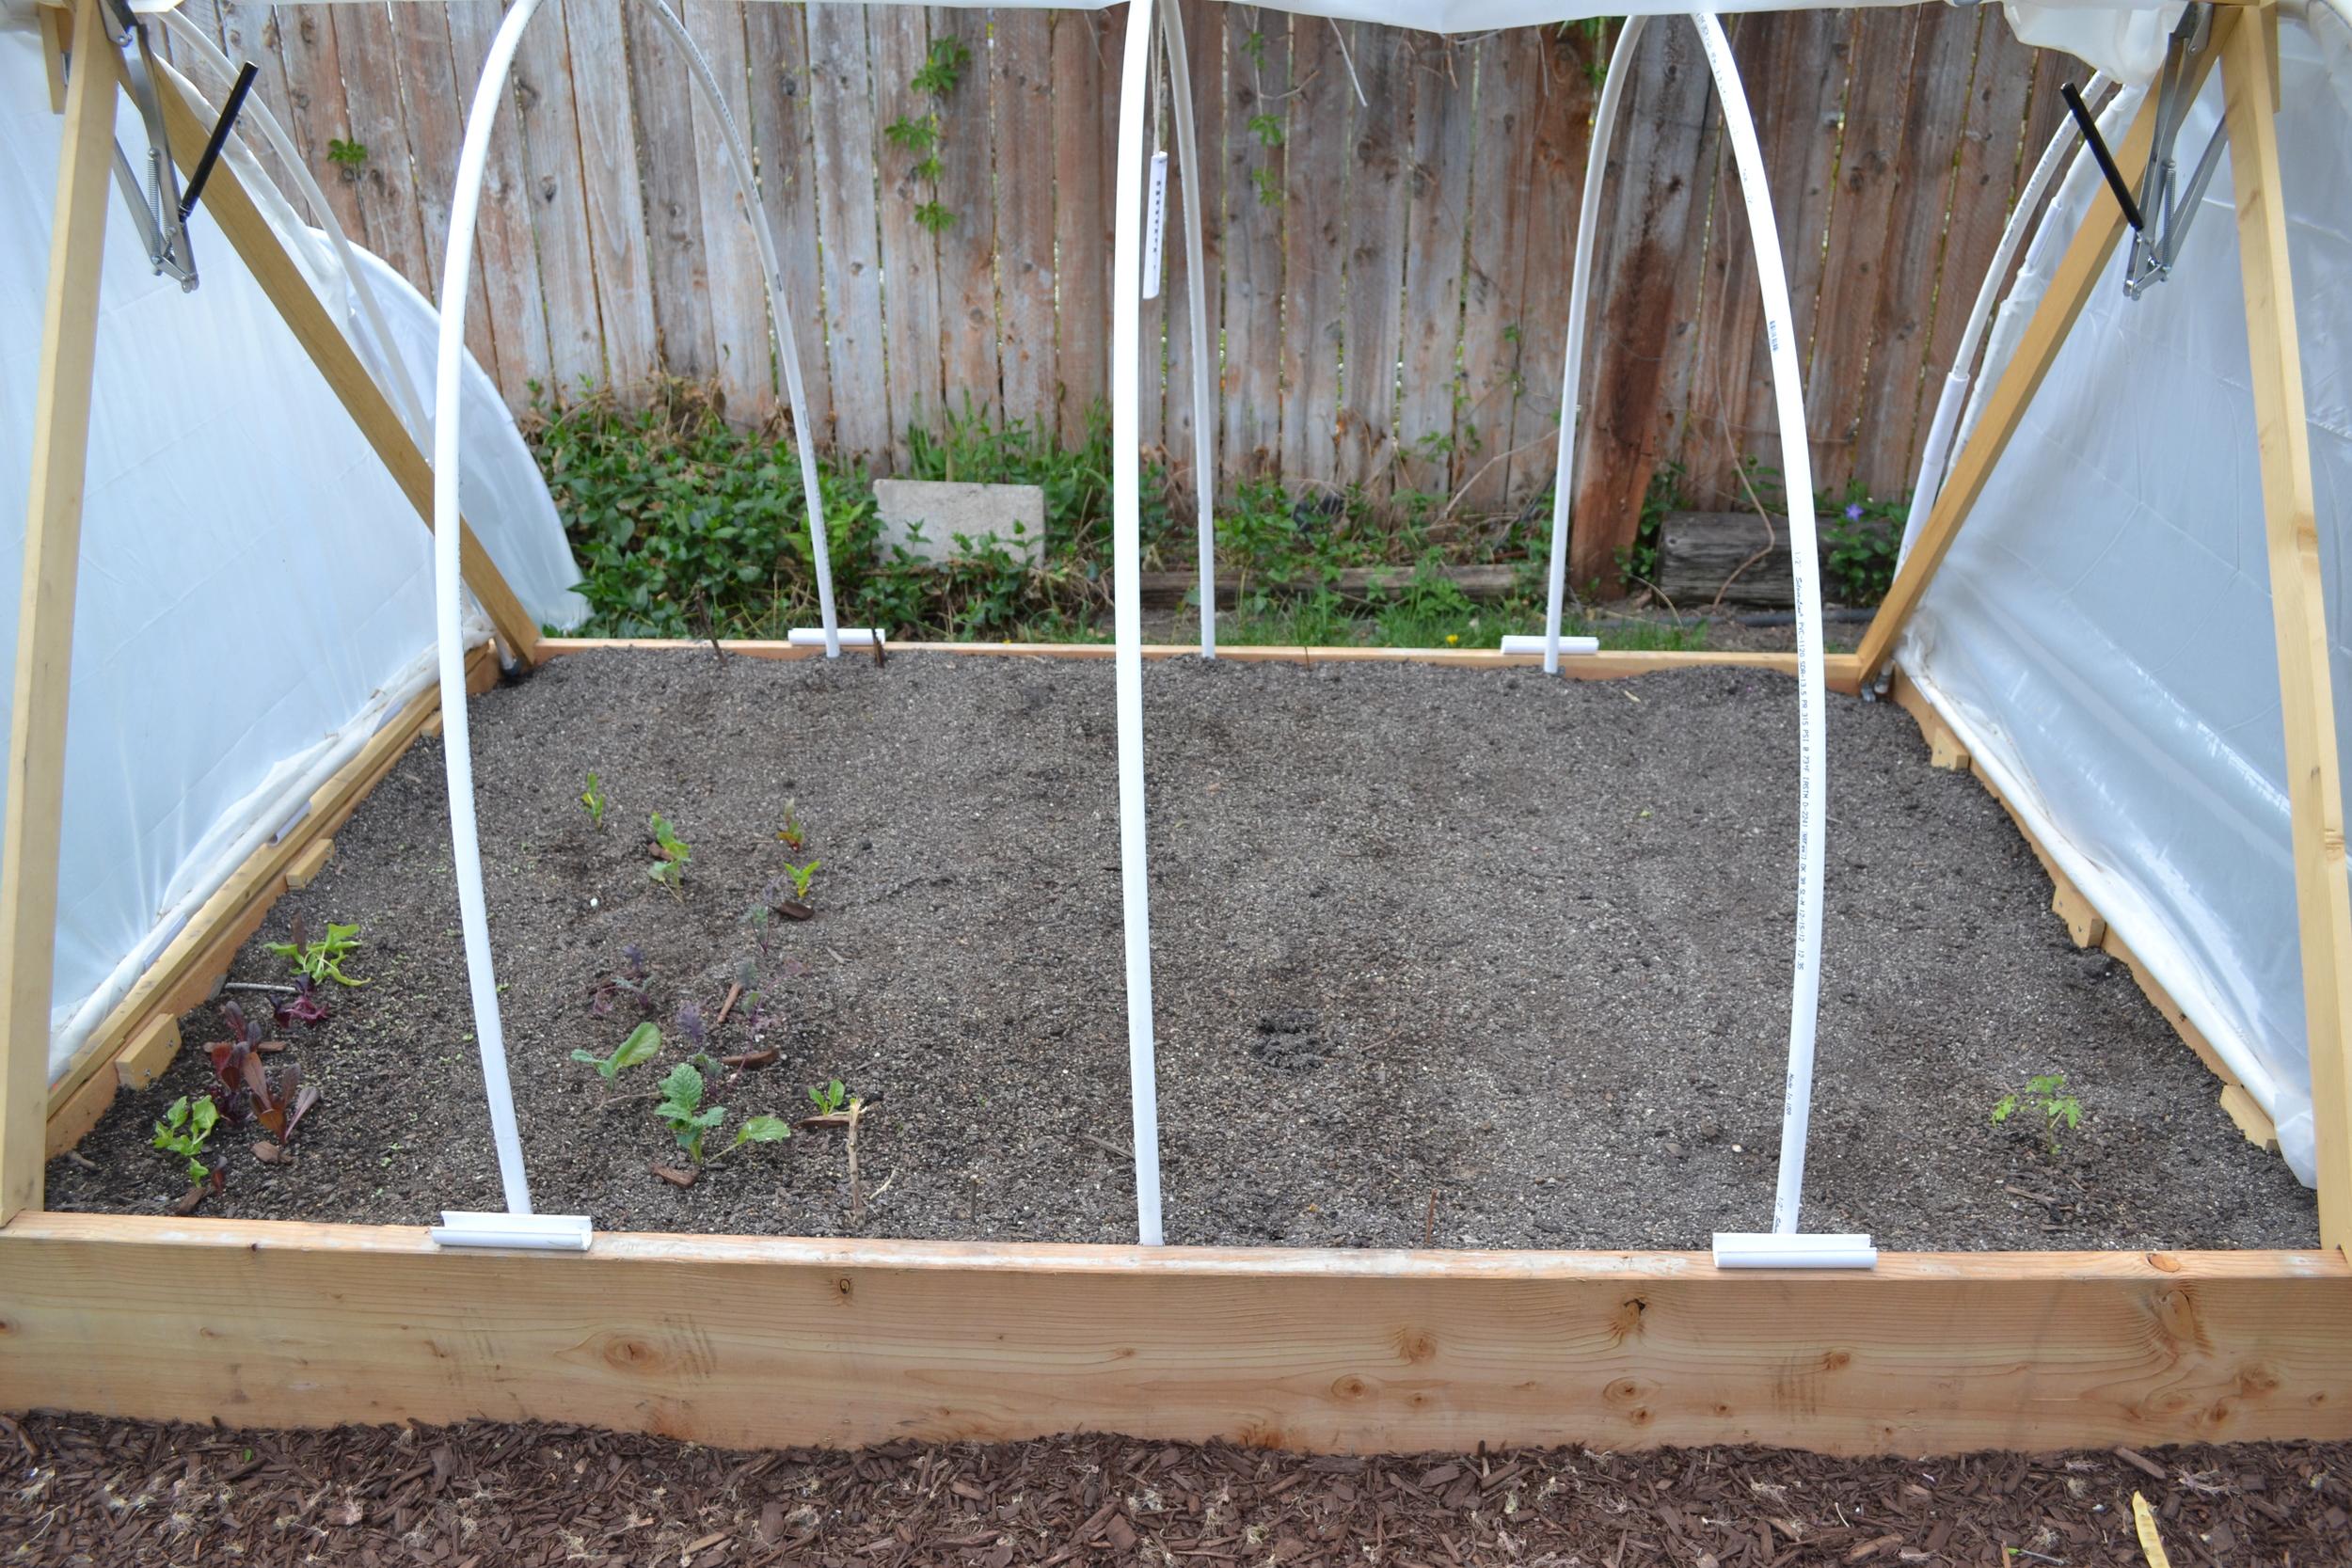 freshly transplanted lettuce, kale, and swiss chard starts on the left.